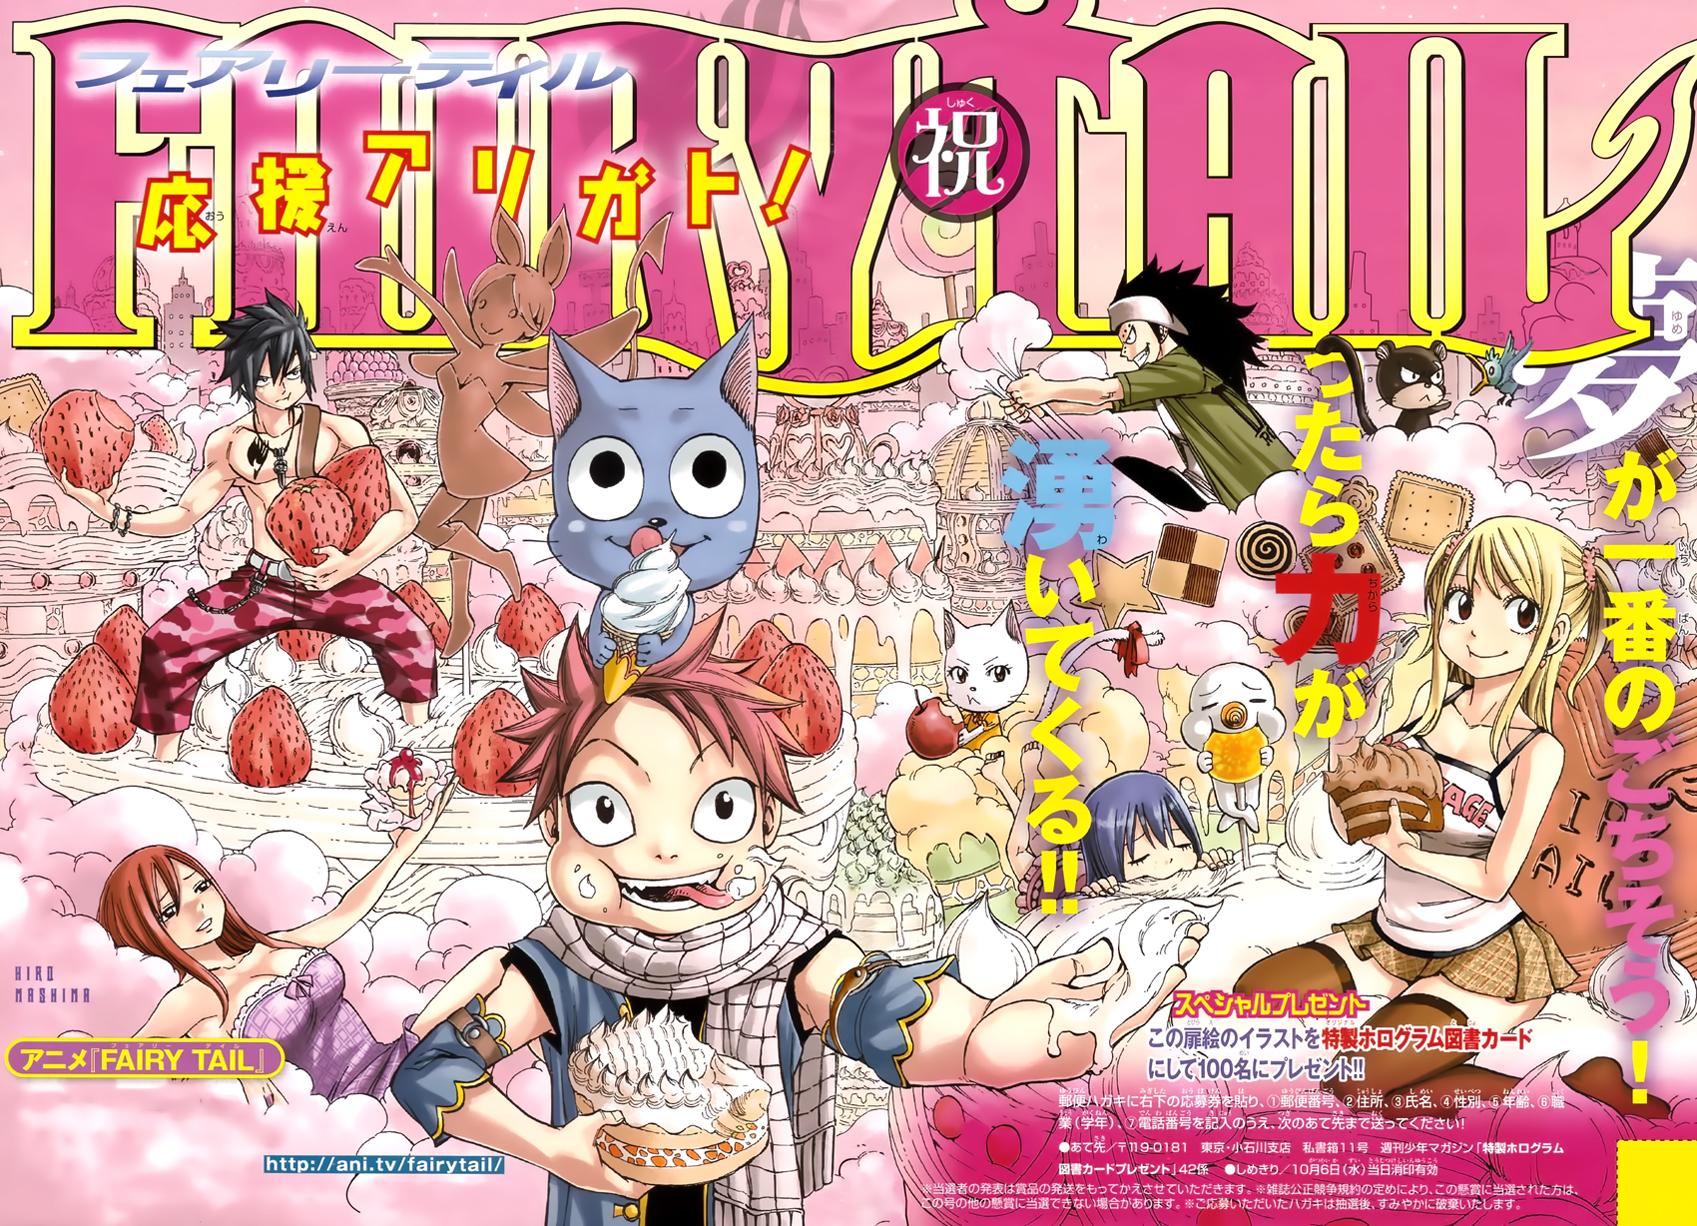 TruyenHay.Com - Ảnh 4 - Fairy Tail Chap 200